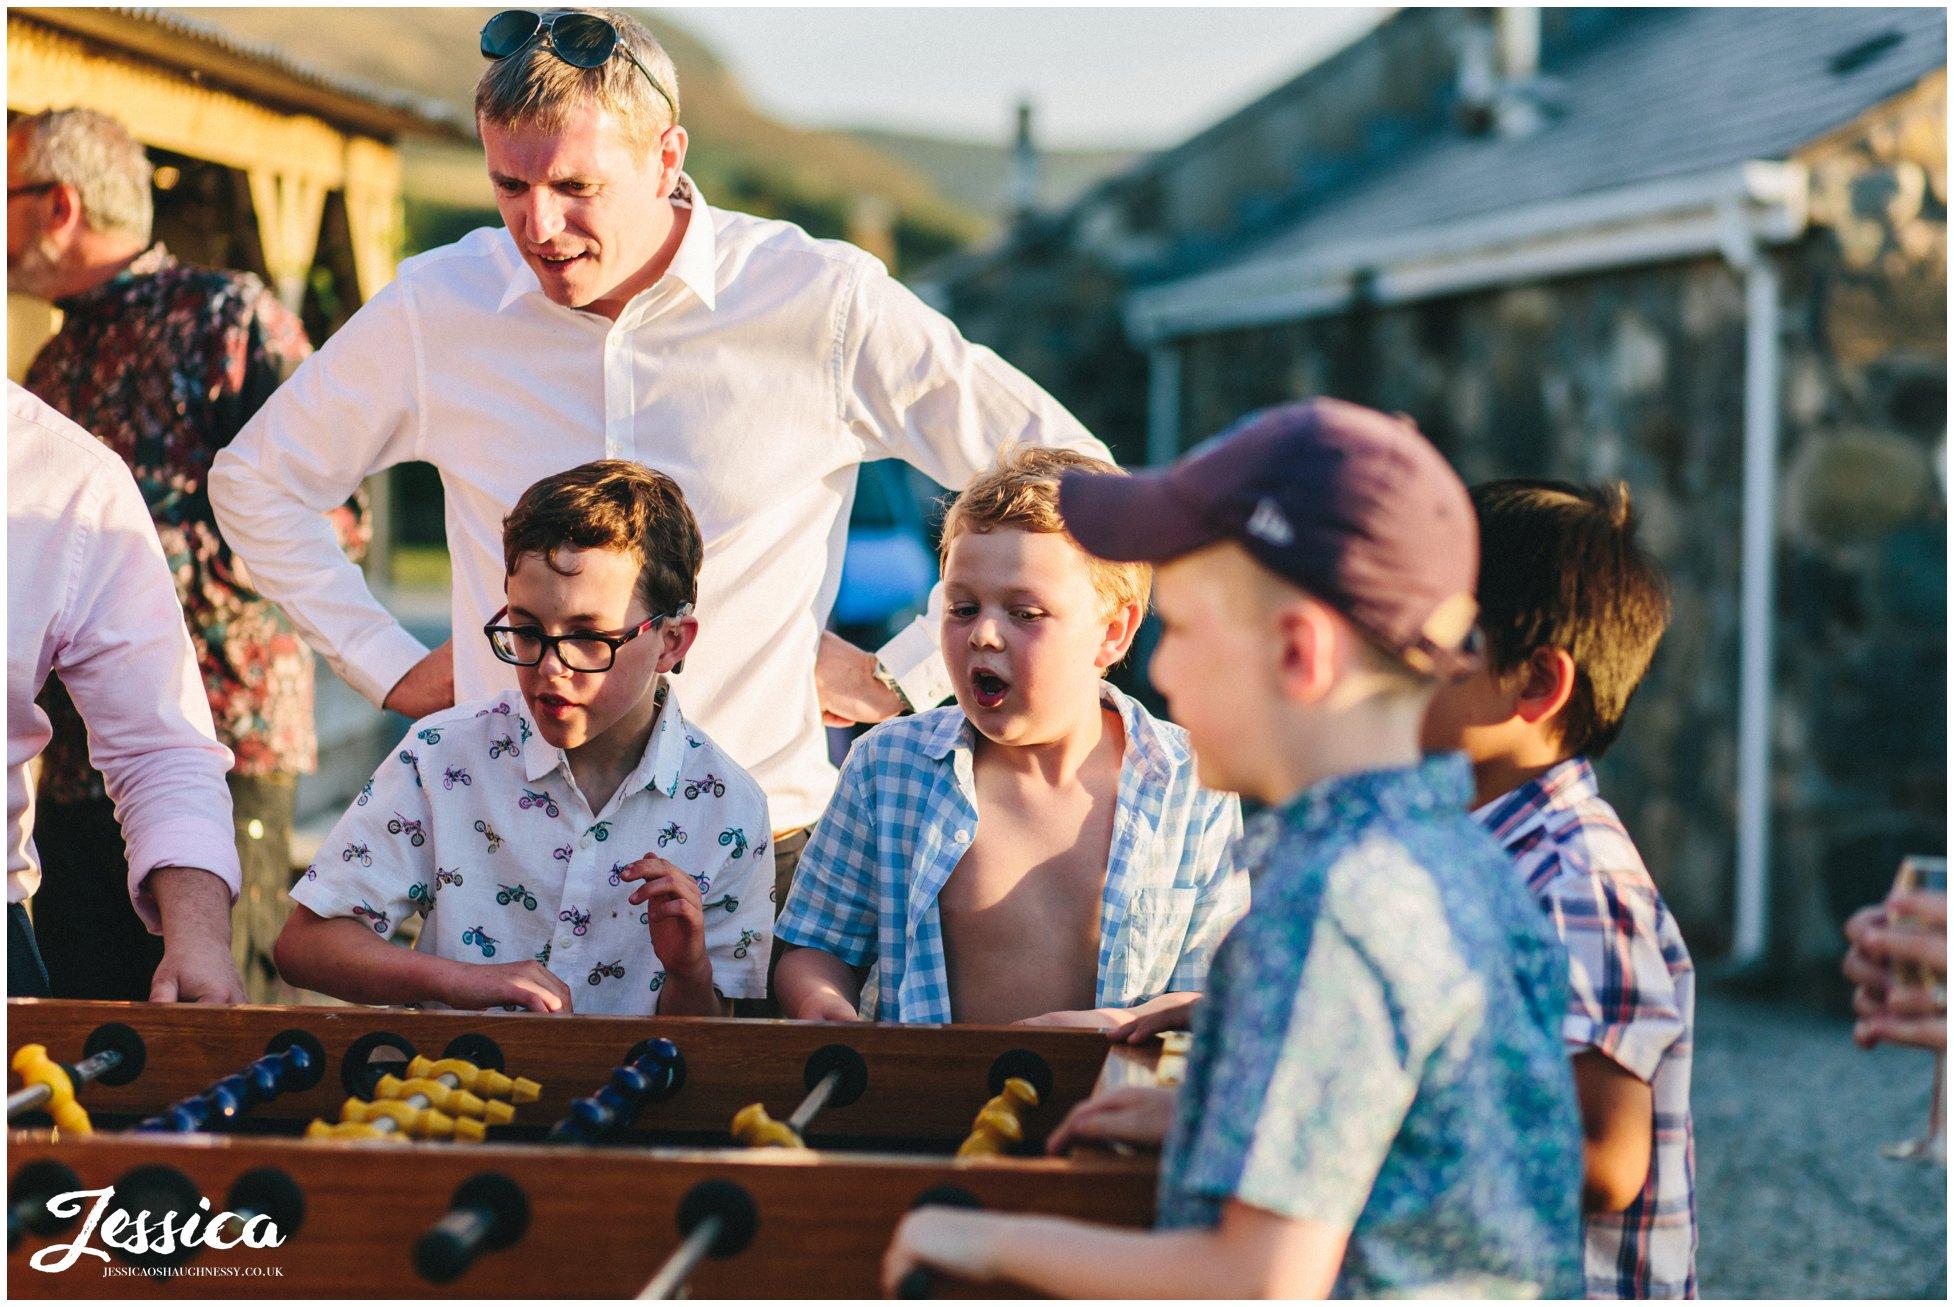 guests cheer as they play table football at bach wen farm in Caernarfon